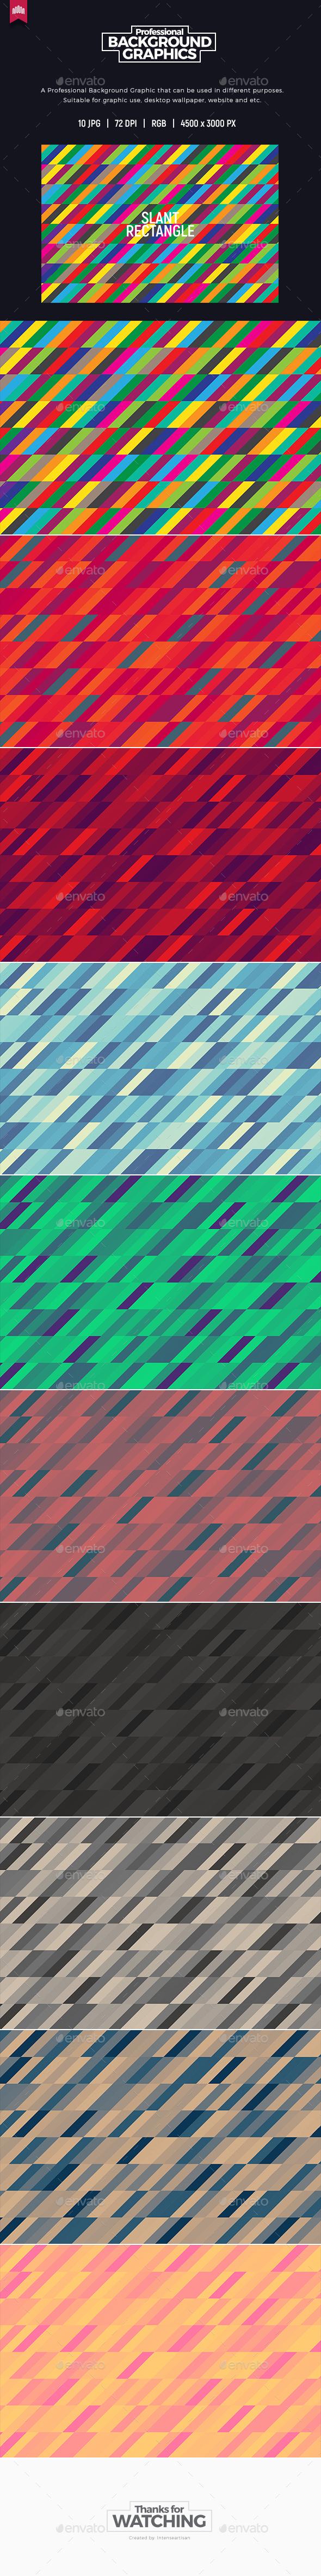 Slant Rectangle Background - Backgrounds Graphics